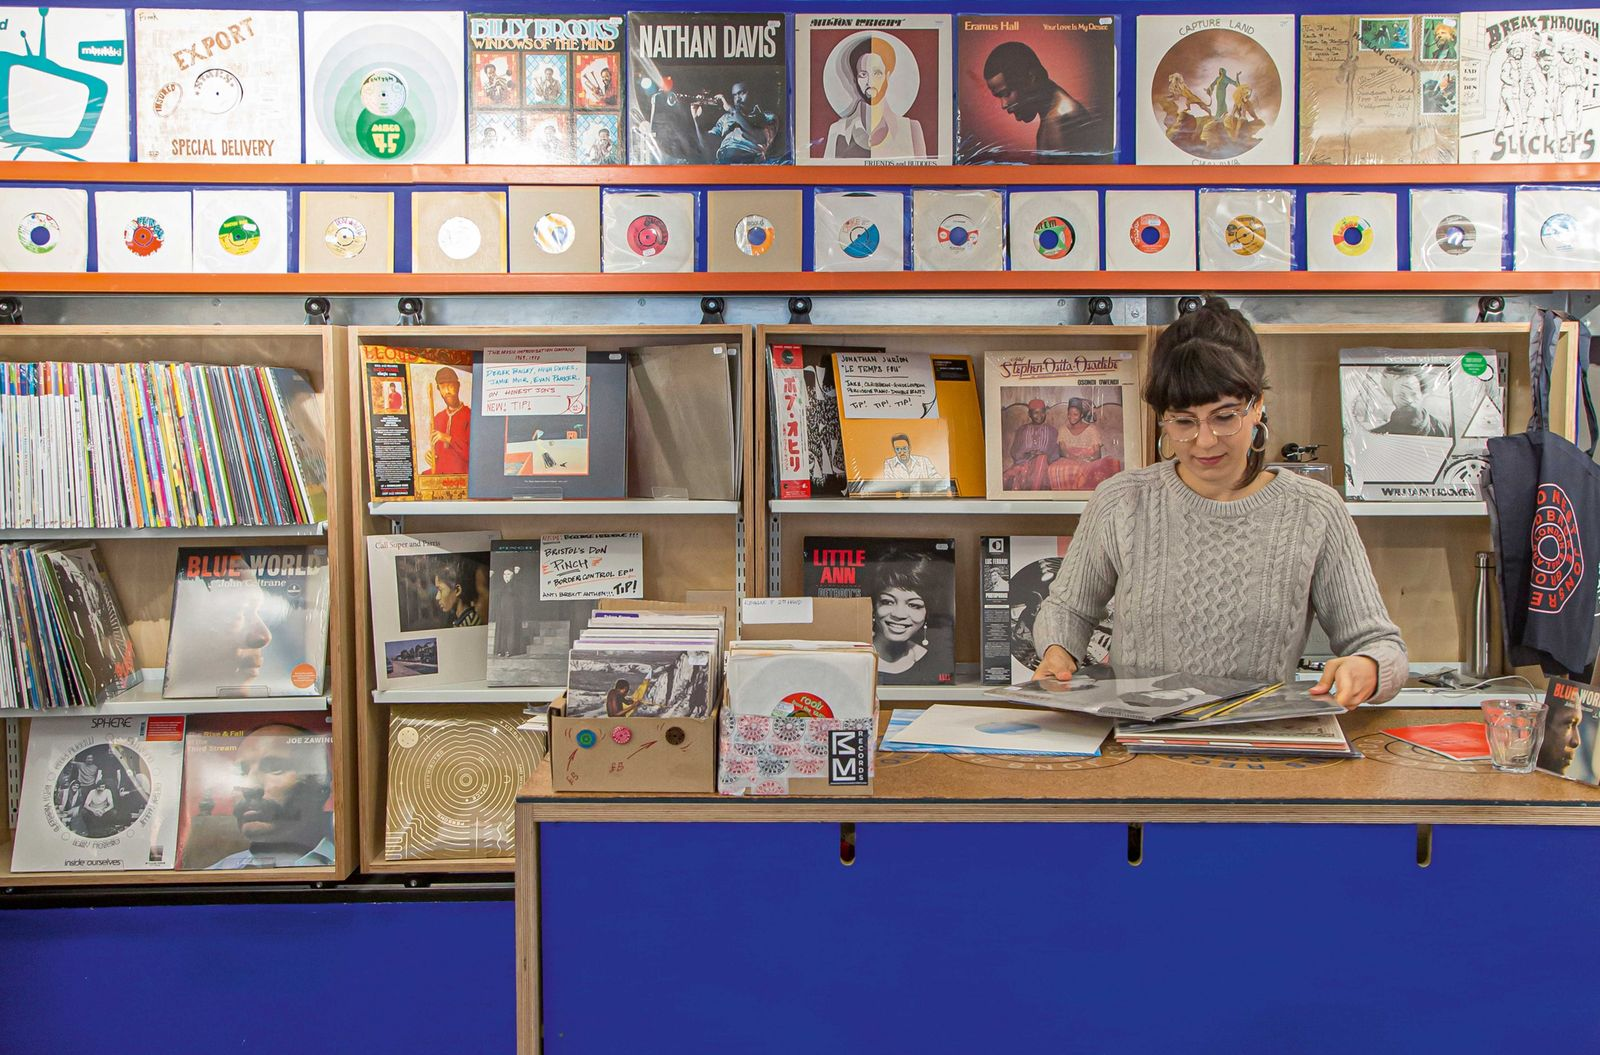 How King's Cross became London's new creative hub